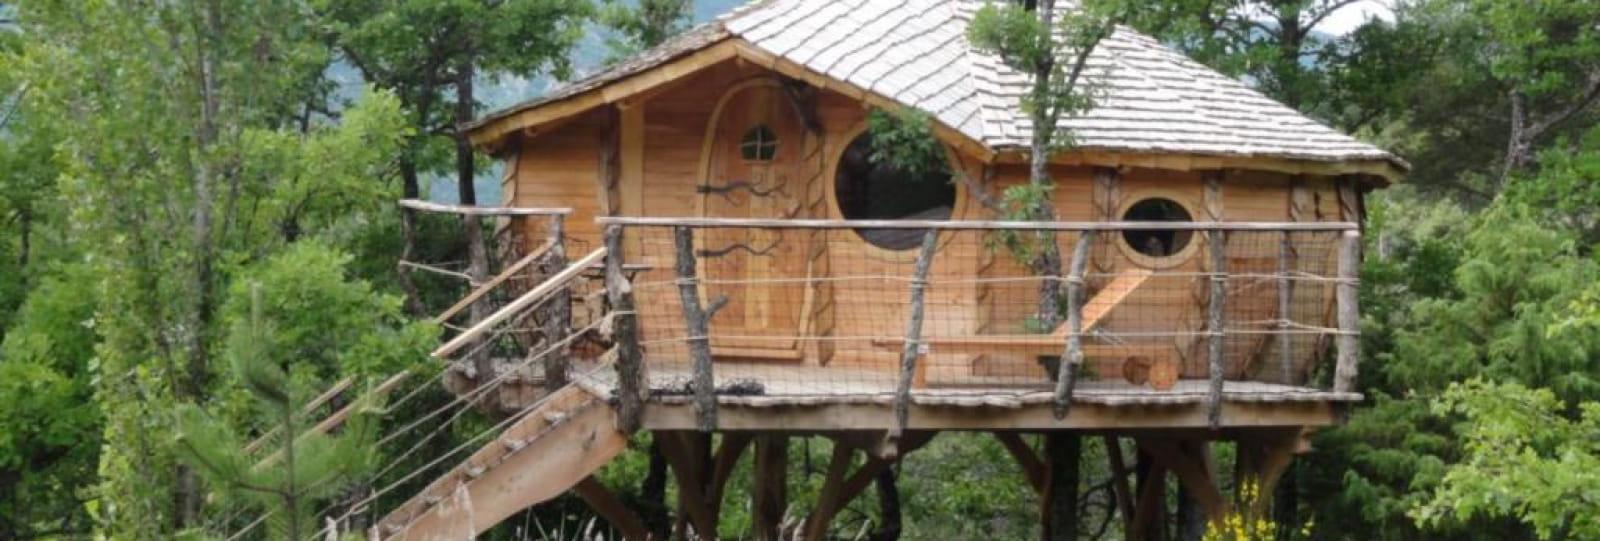 Oasis Bellecombe Eco-Site : tree house, yurts, teepee, caravan